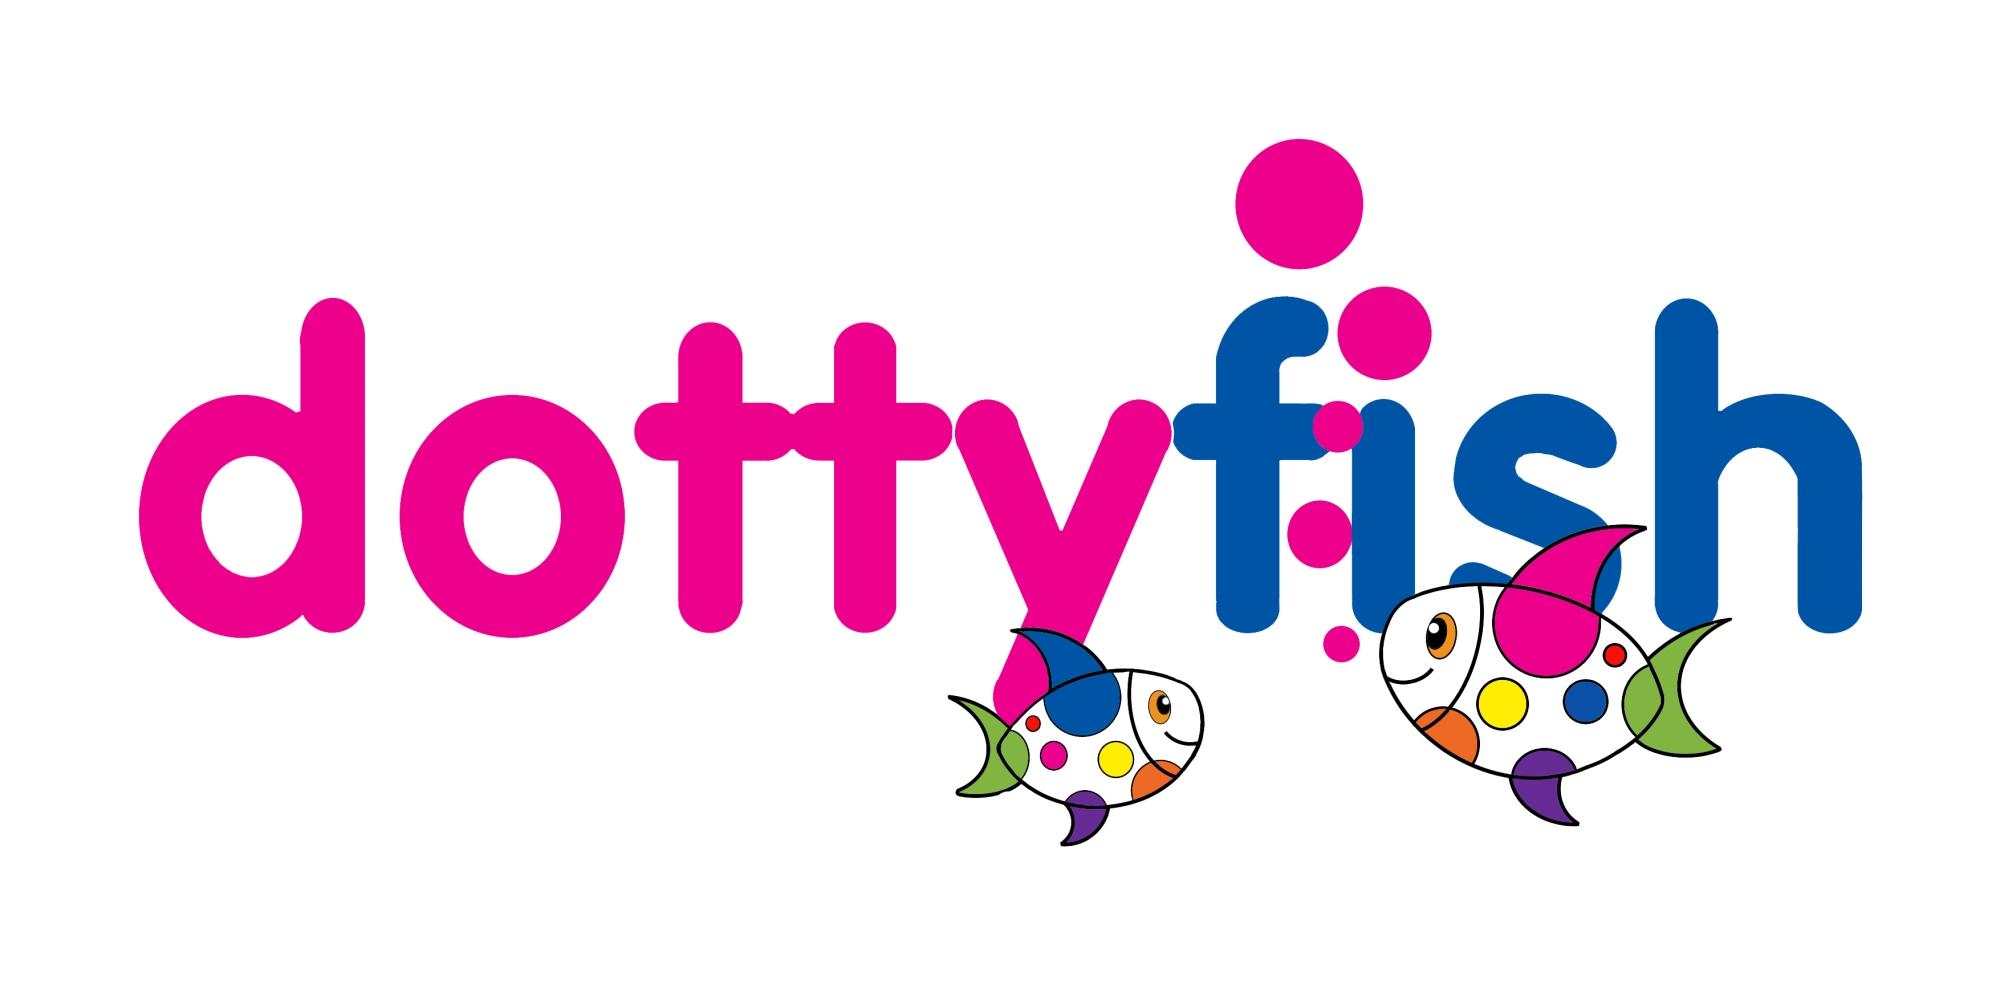 Dotty Fish 's logo